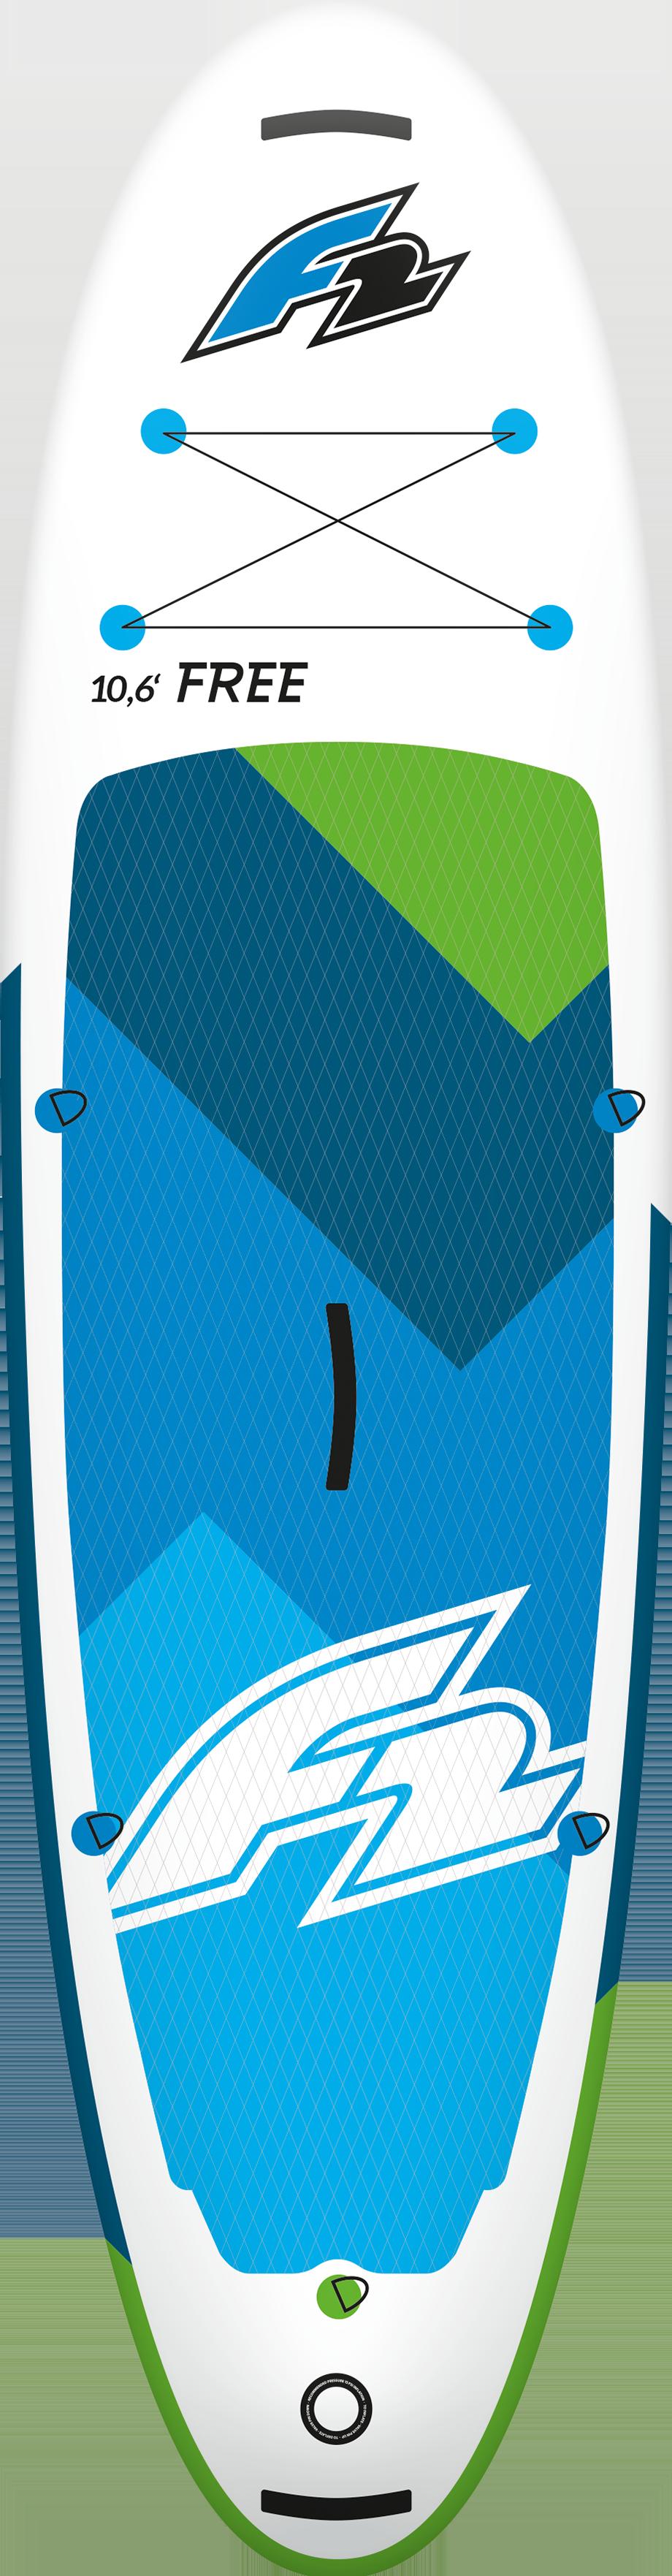 FREE GREEN - Top